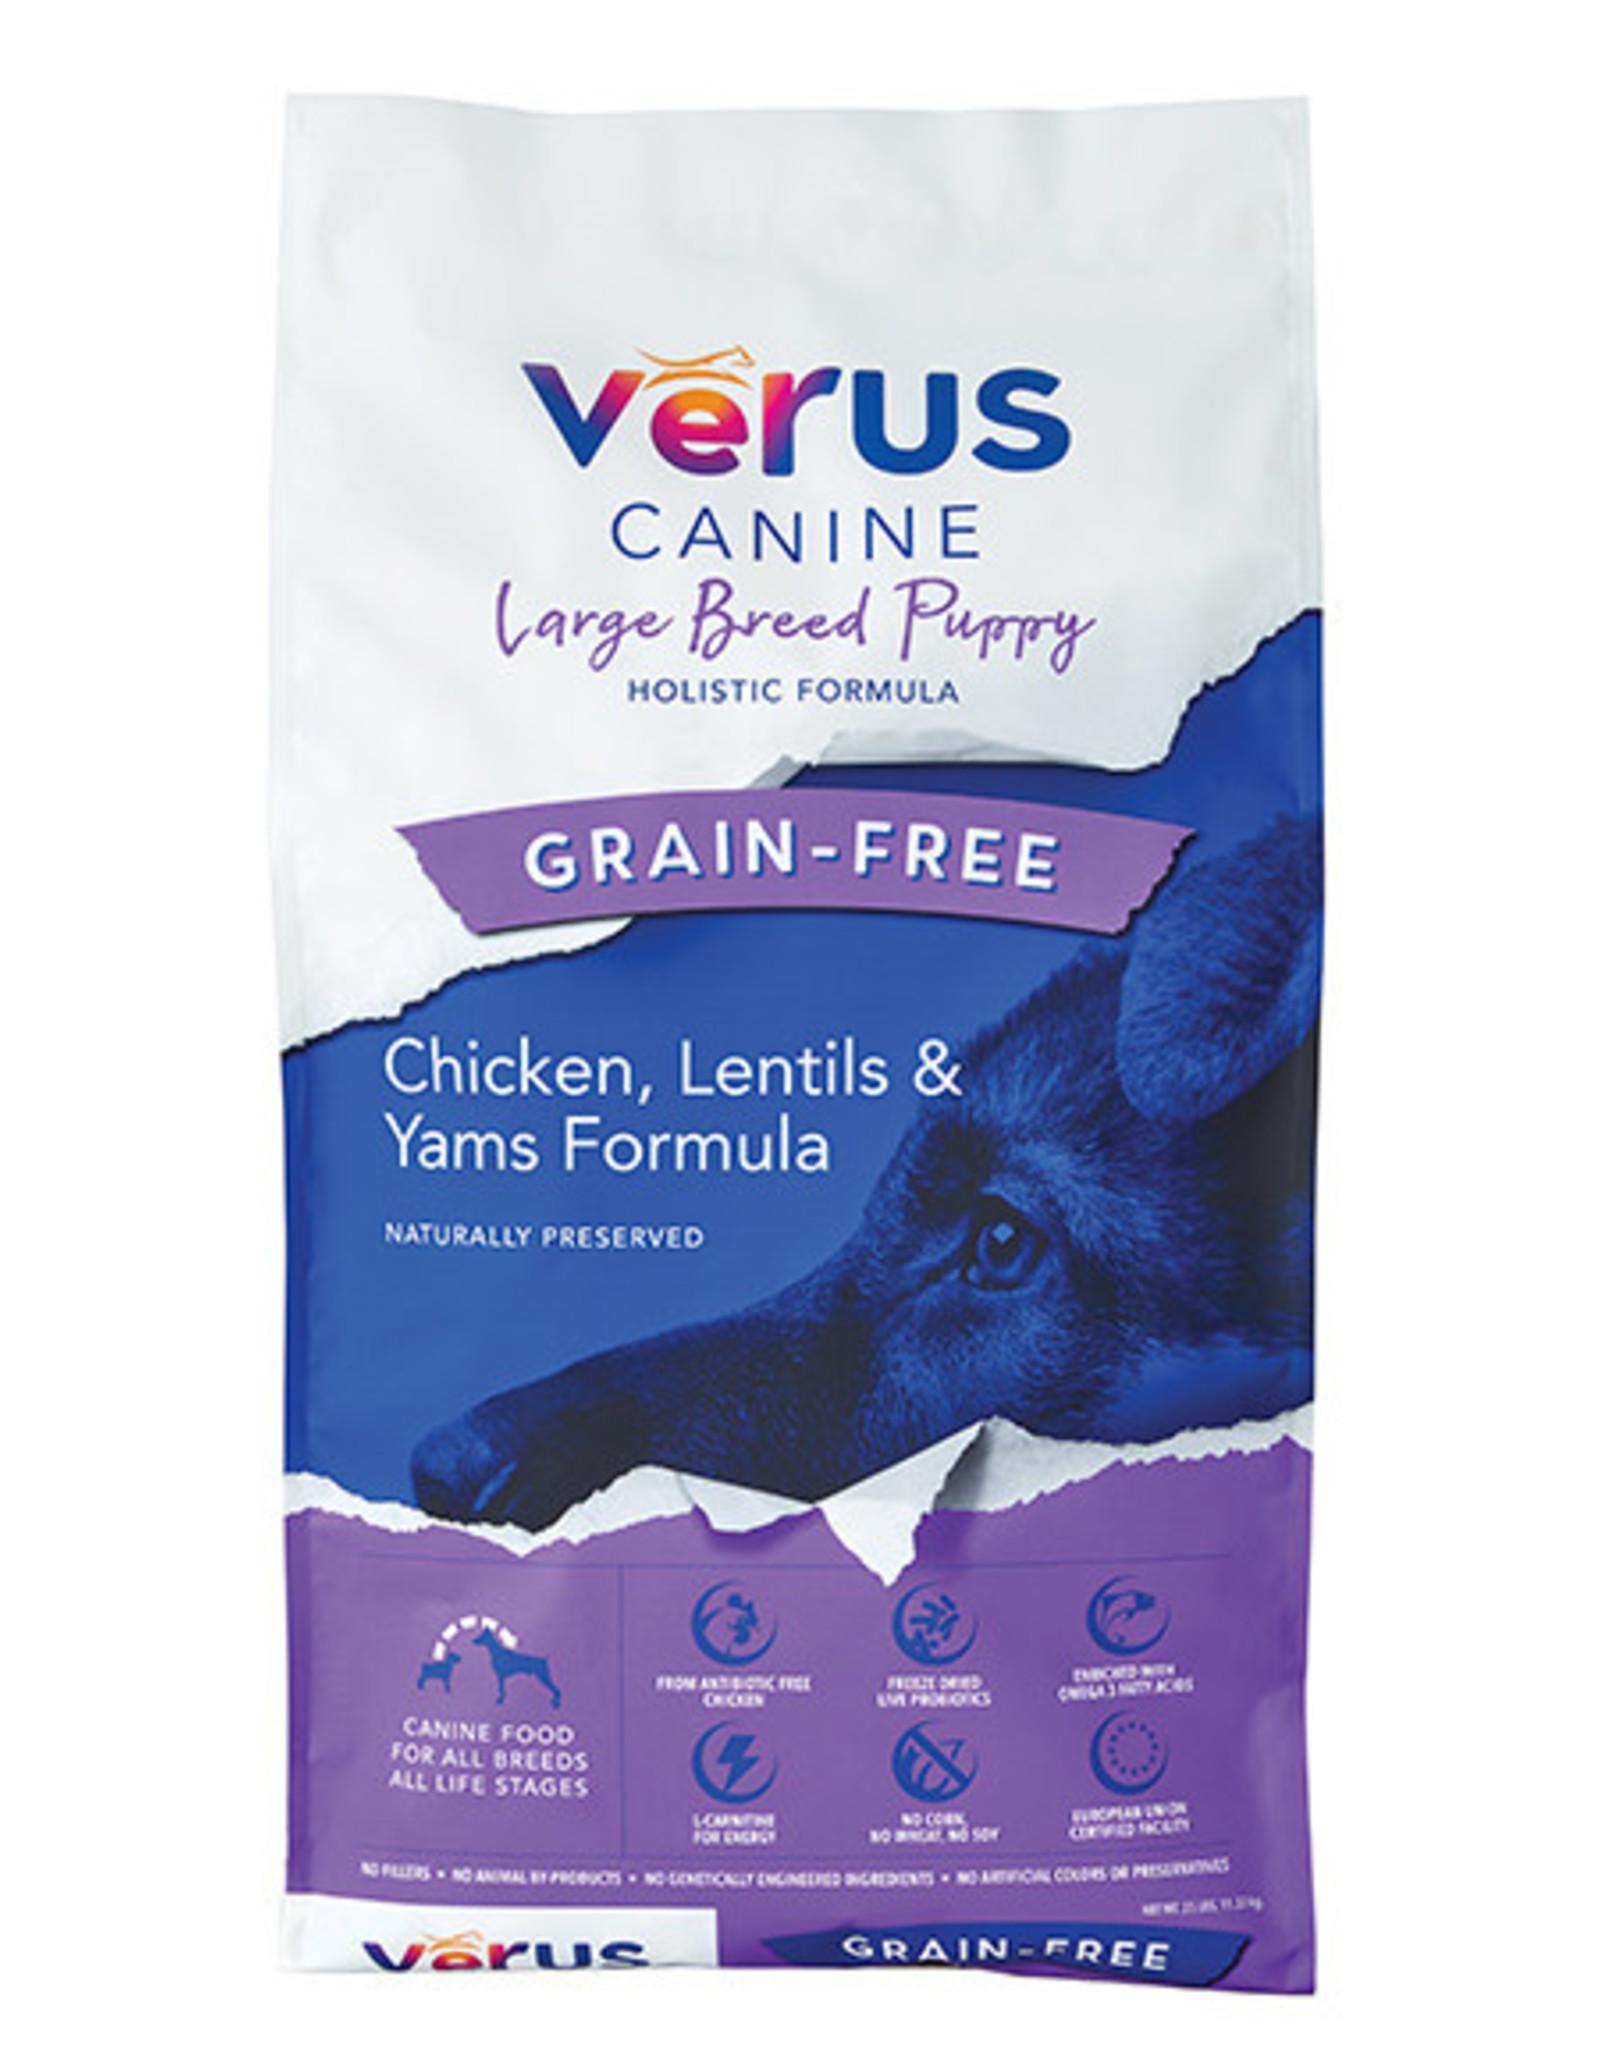 VeRUS VeRUS Large Breed Puppy